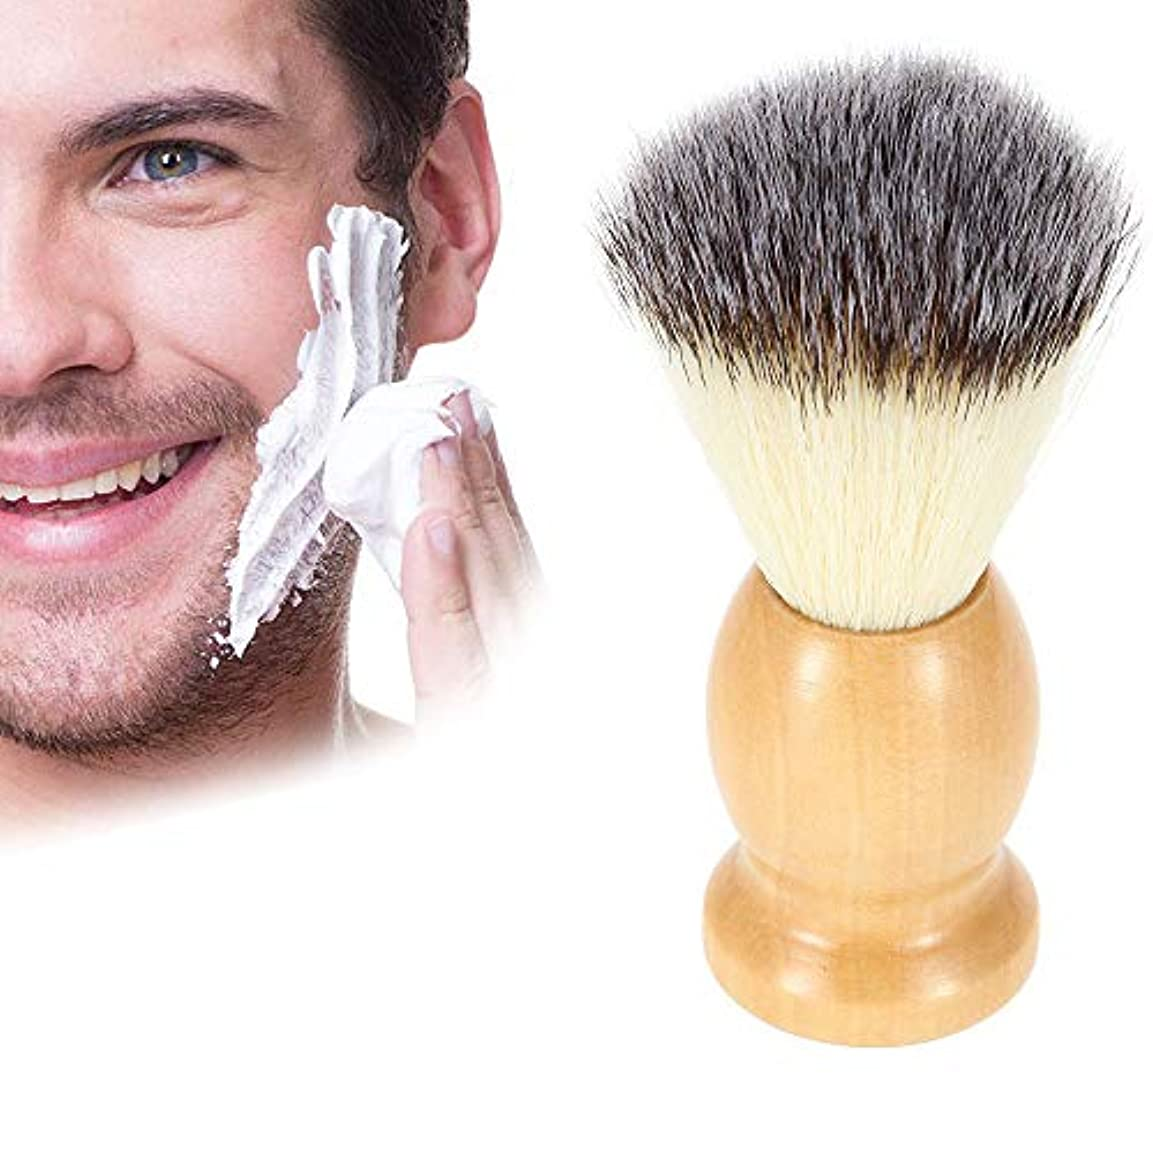 Butokal ナイロンひげブラシ メンズ用ブラシ 木製ハンドルシェービングブラシ 泡立ち ひげブラシ 理容 洗顔 髭剃り ご主人 ボーイフレンド 友人 にプレゼント シェービング用アクセサリー